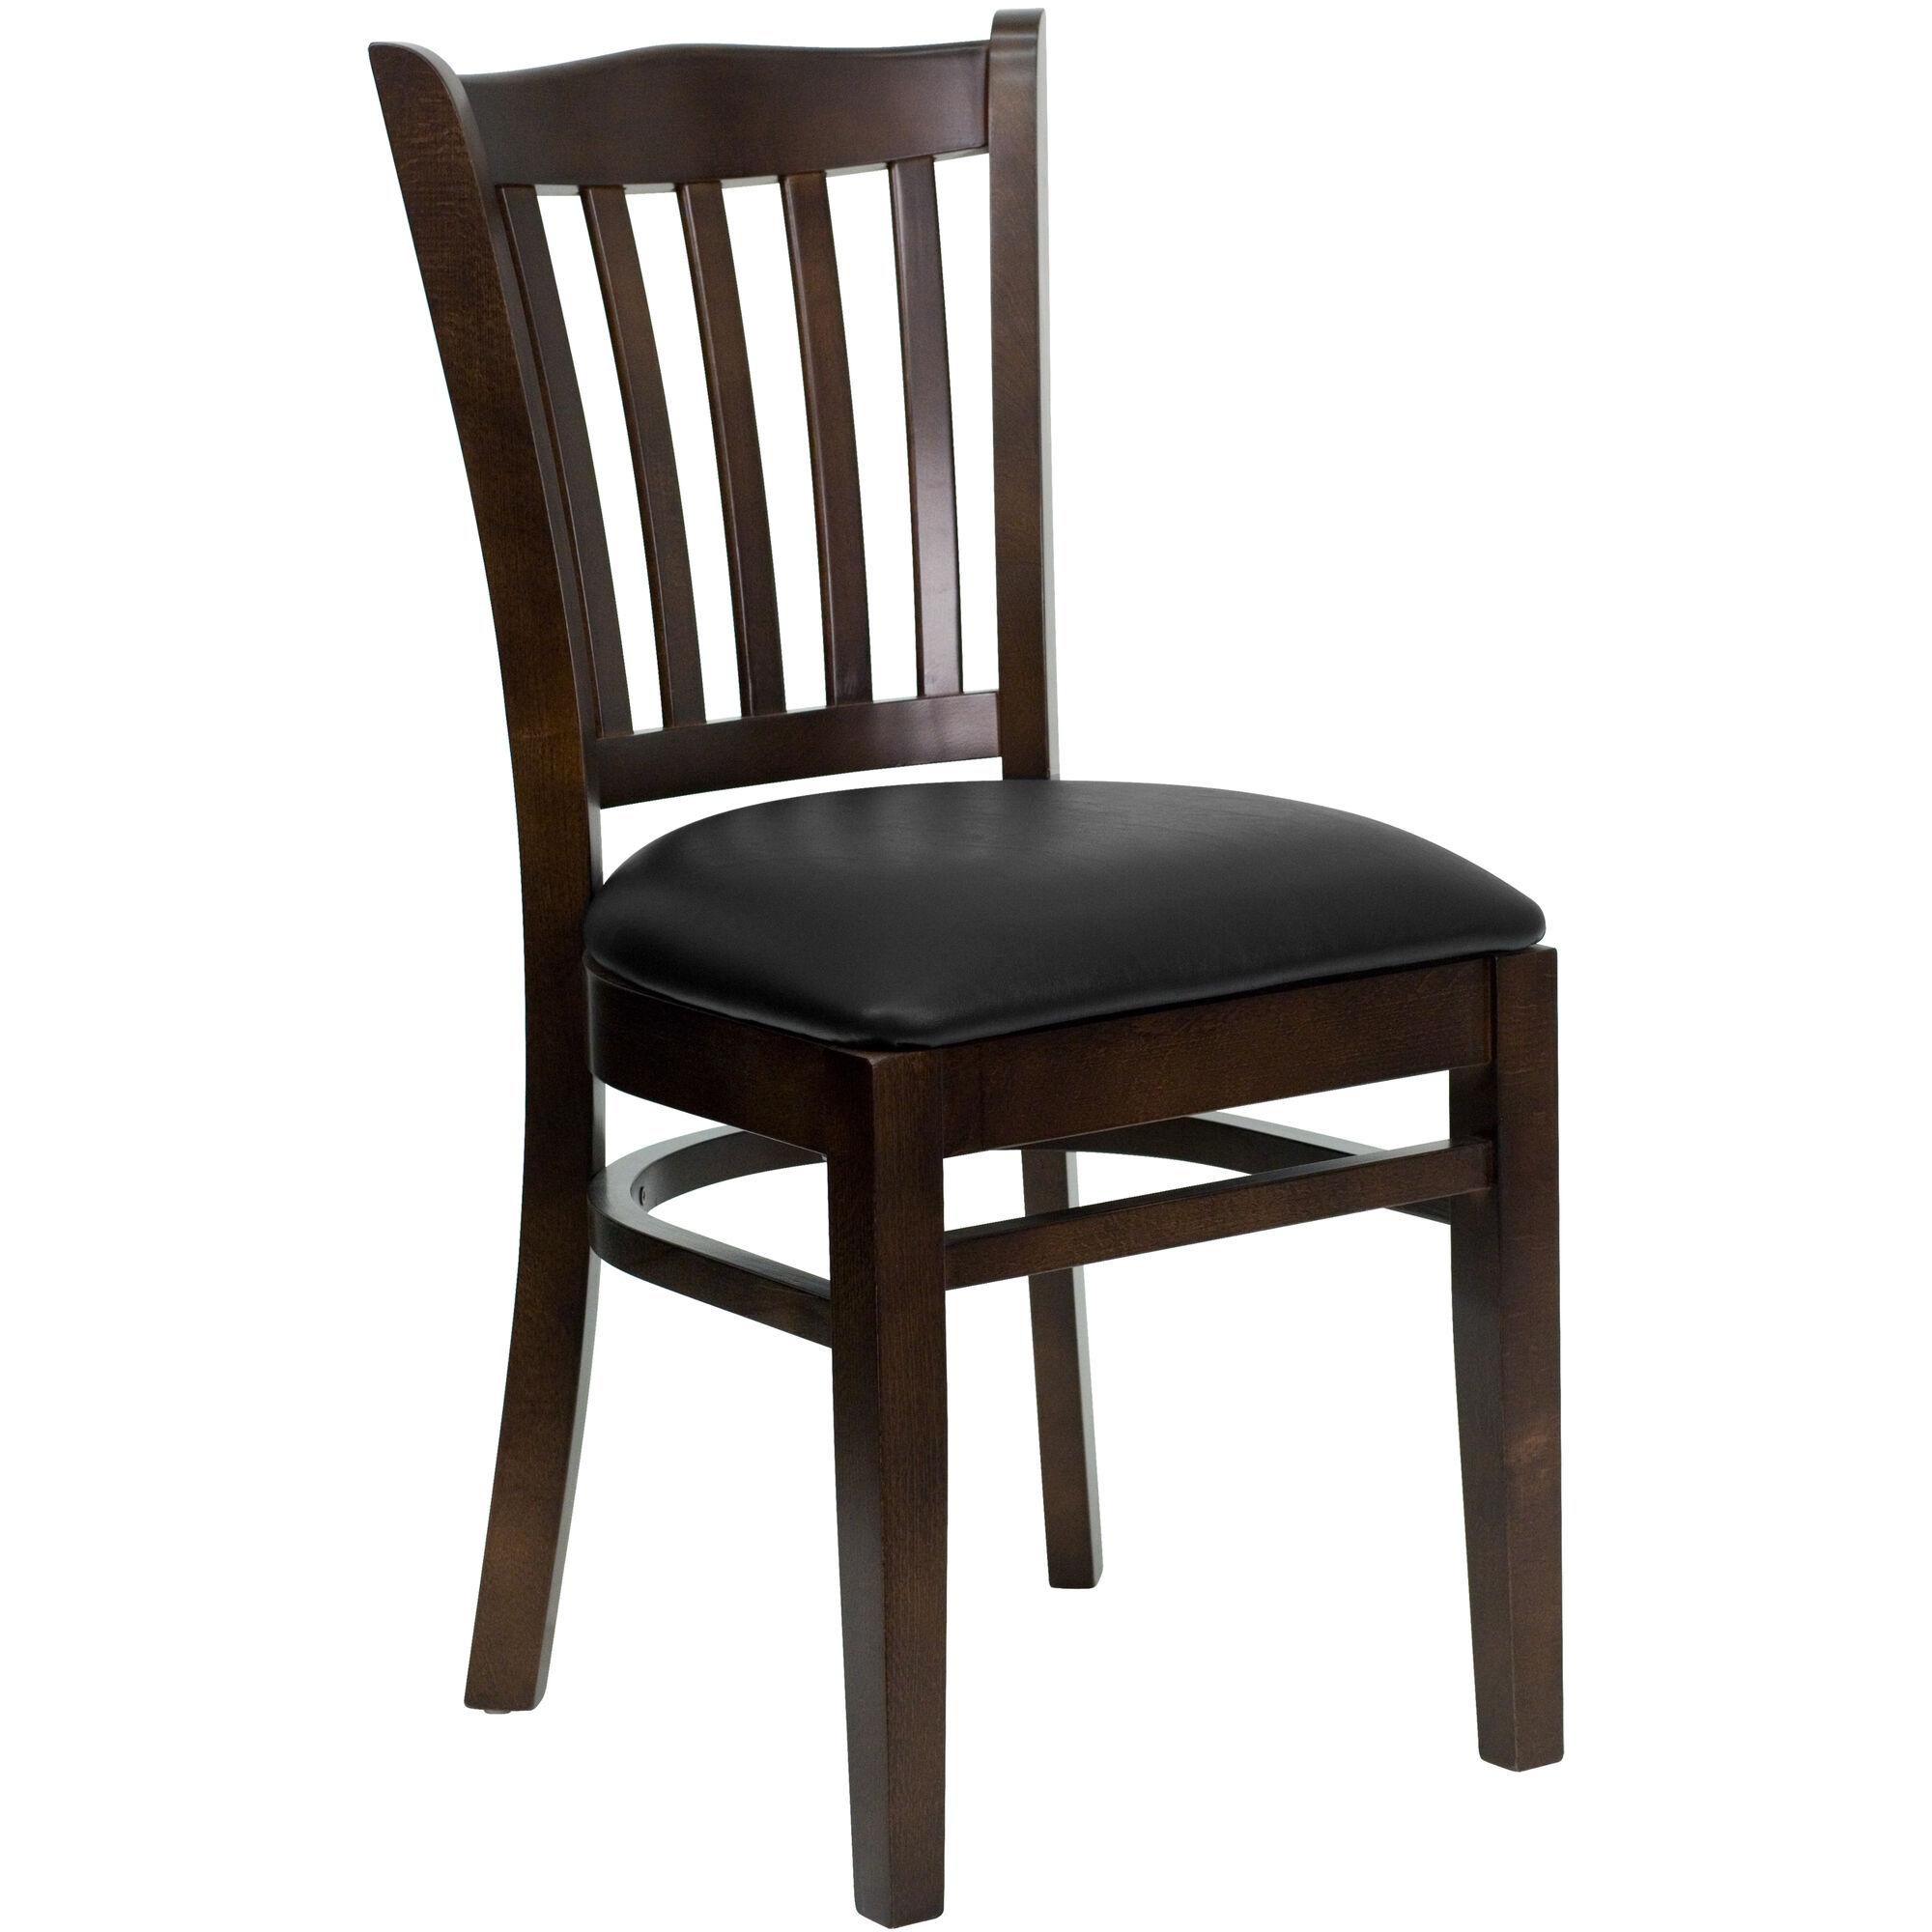 Walnut Wood Chair Blk Vinyl Bfdh 8242wbk Tdr